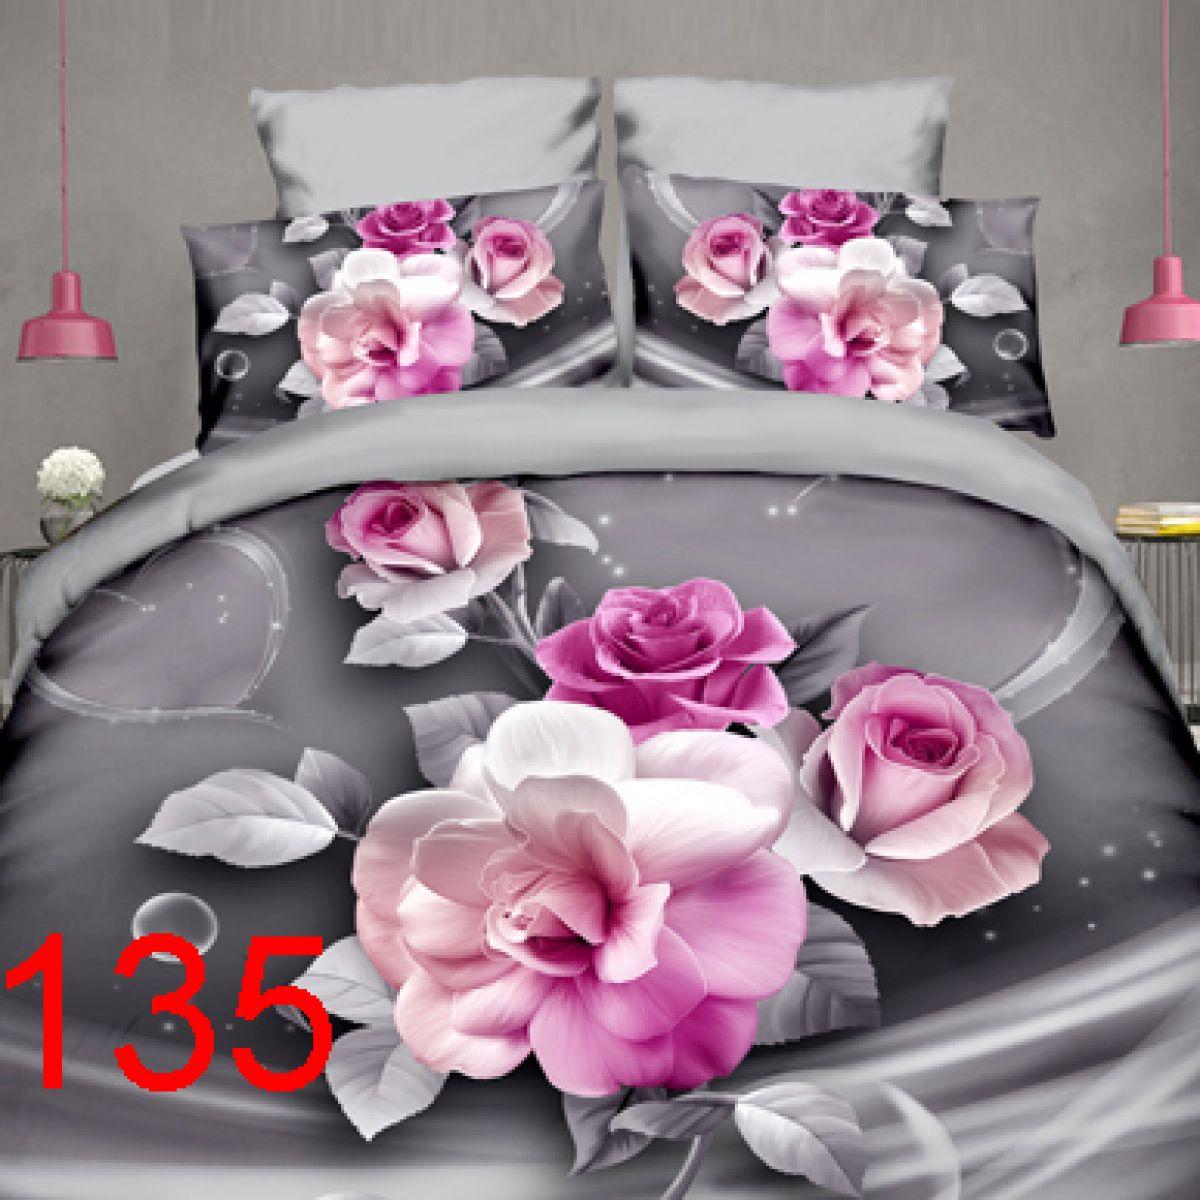 3D Beddings - Antonio - AML-135 - 160x200 cm - 4 pcs